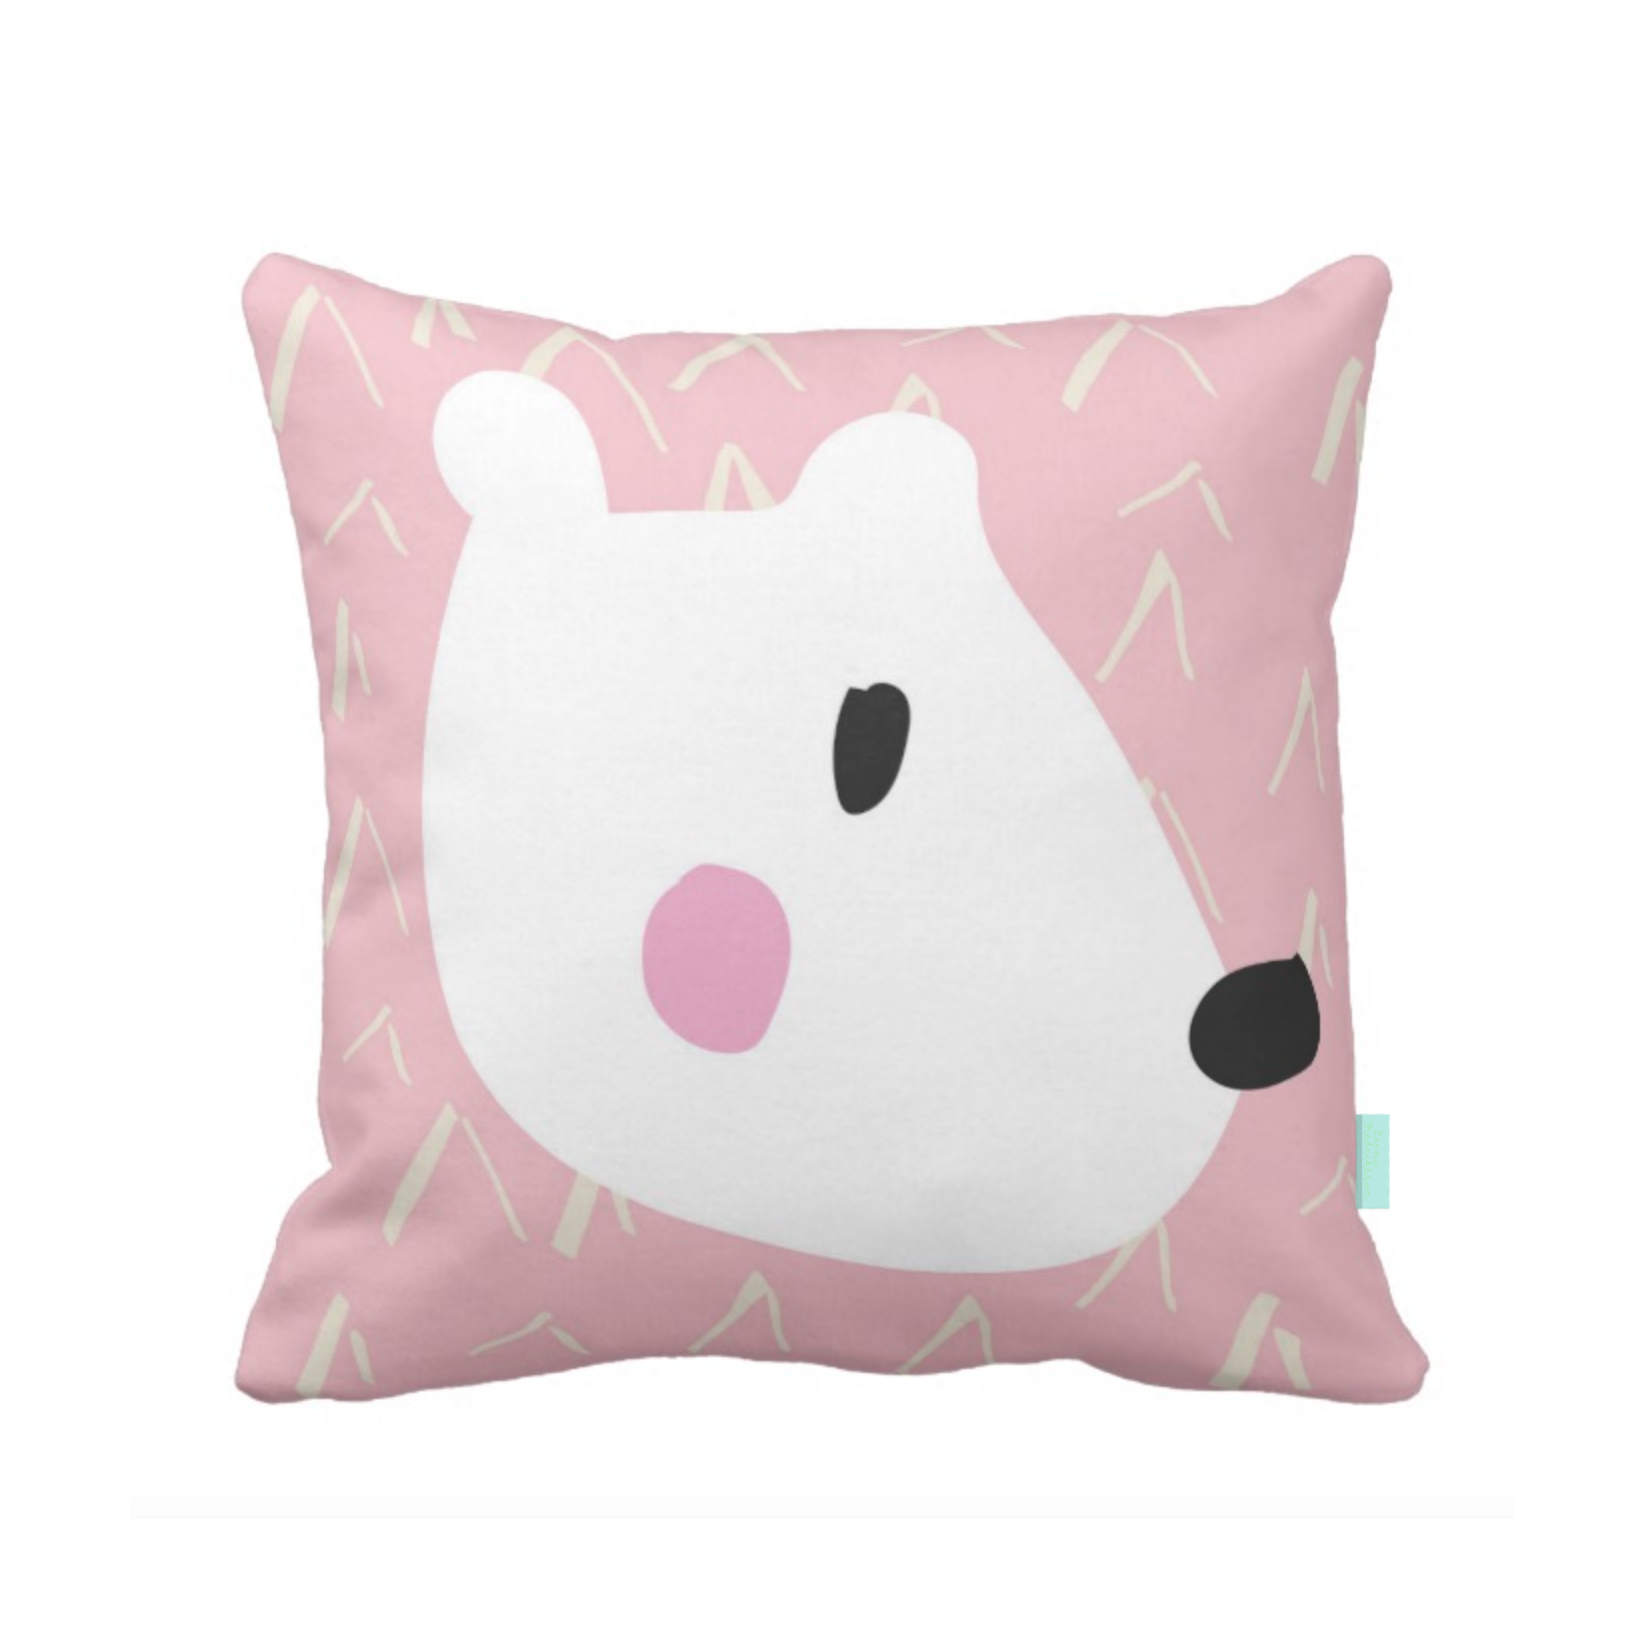 KOTI halinalle,  pillow, light